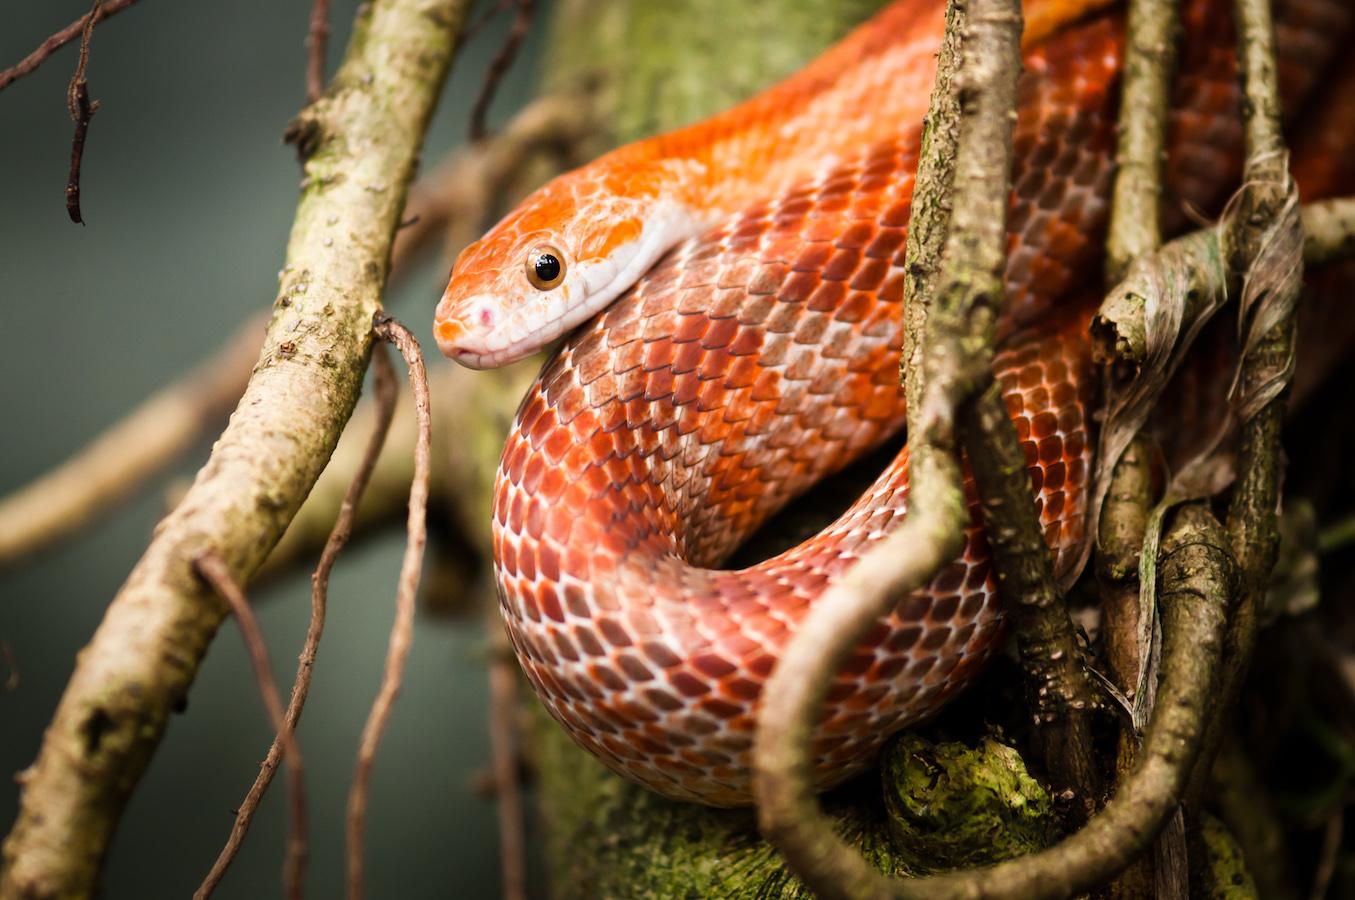 red rat snake in capture